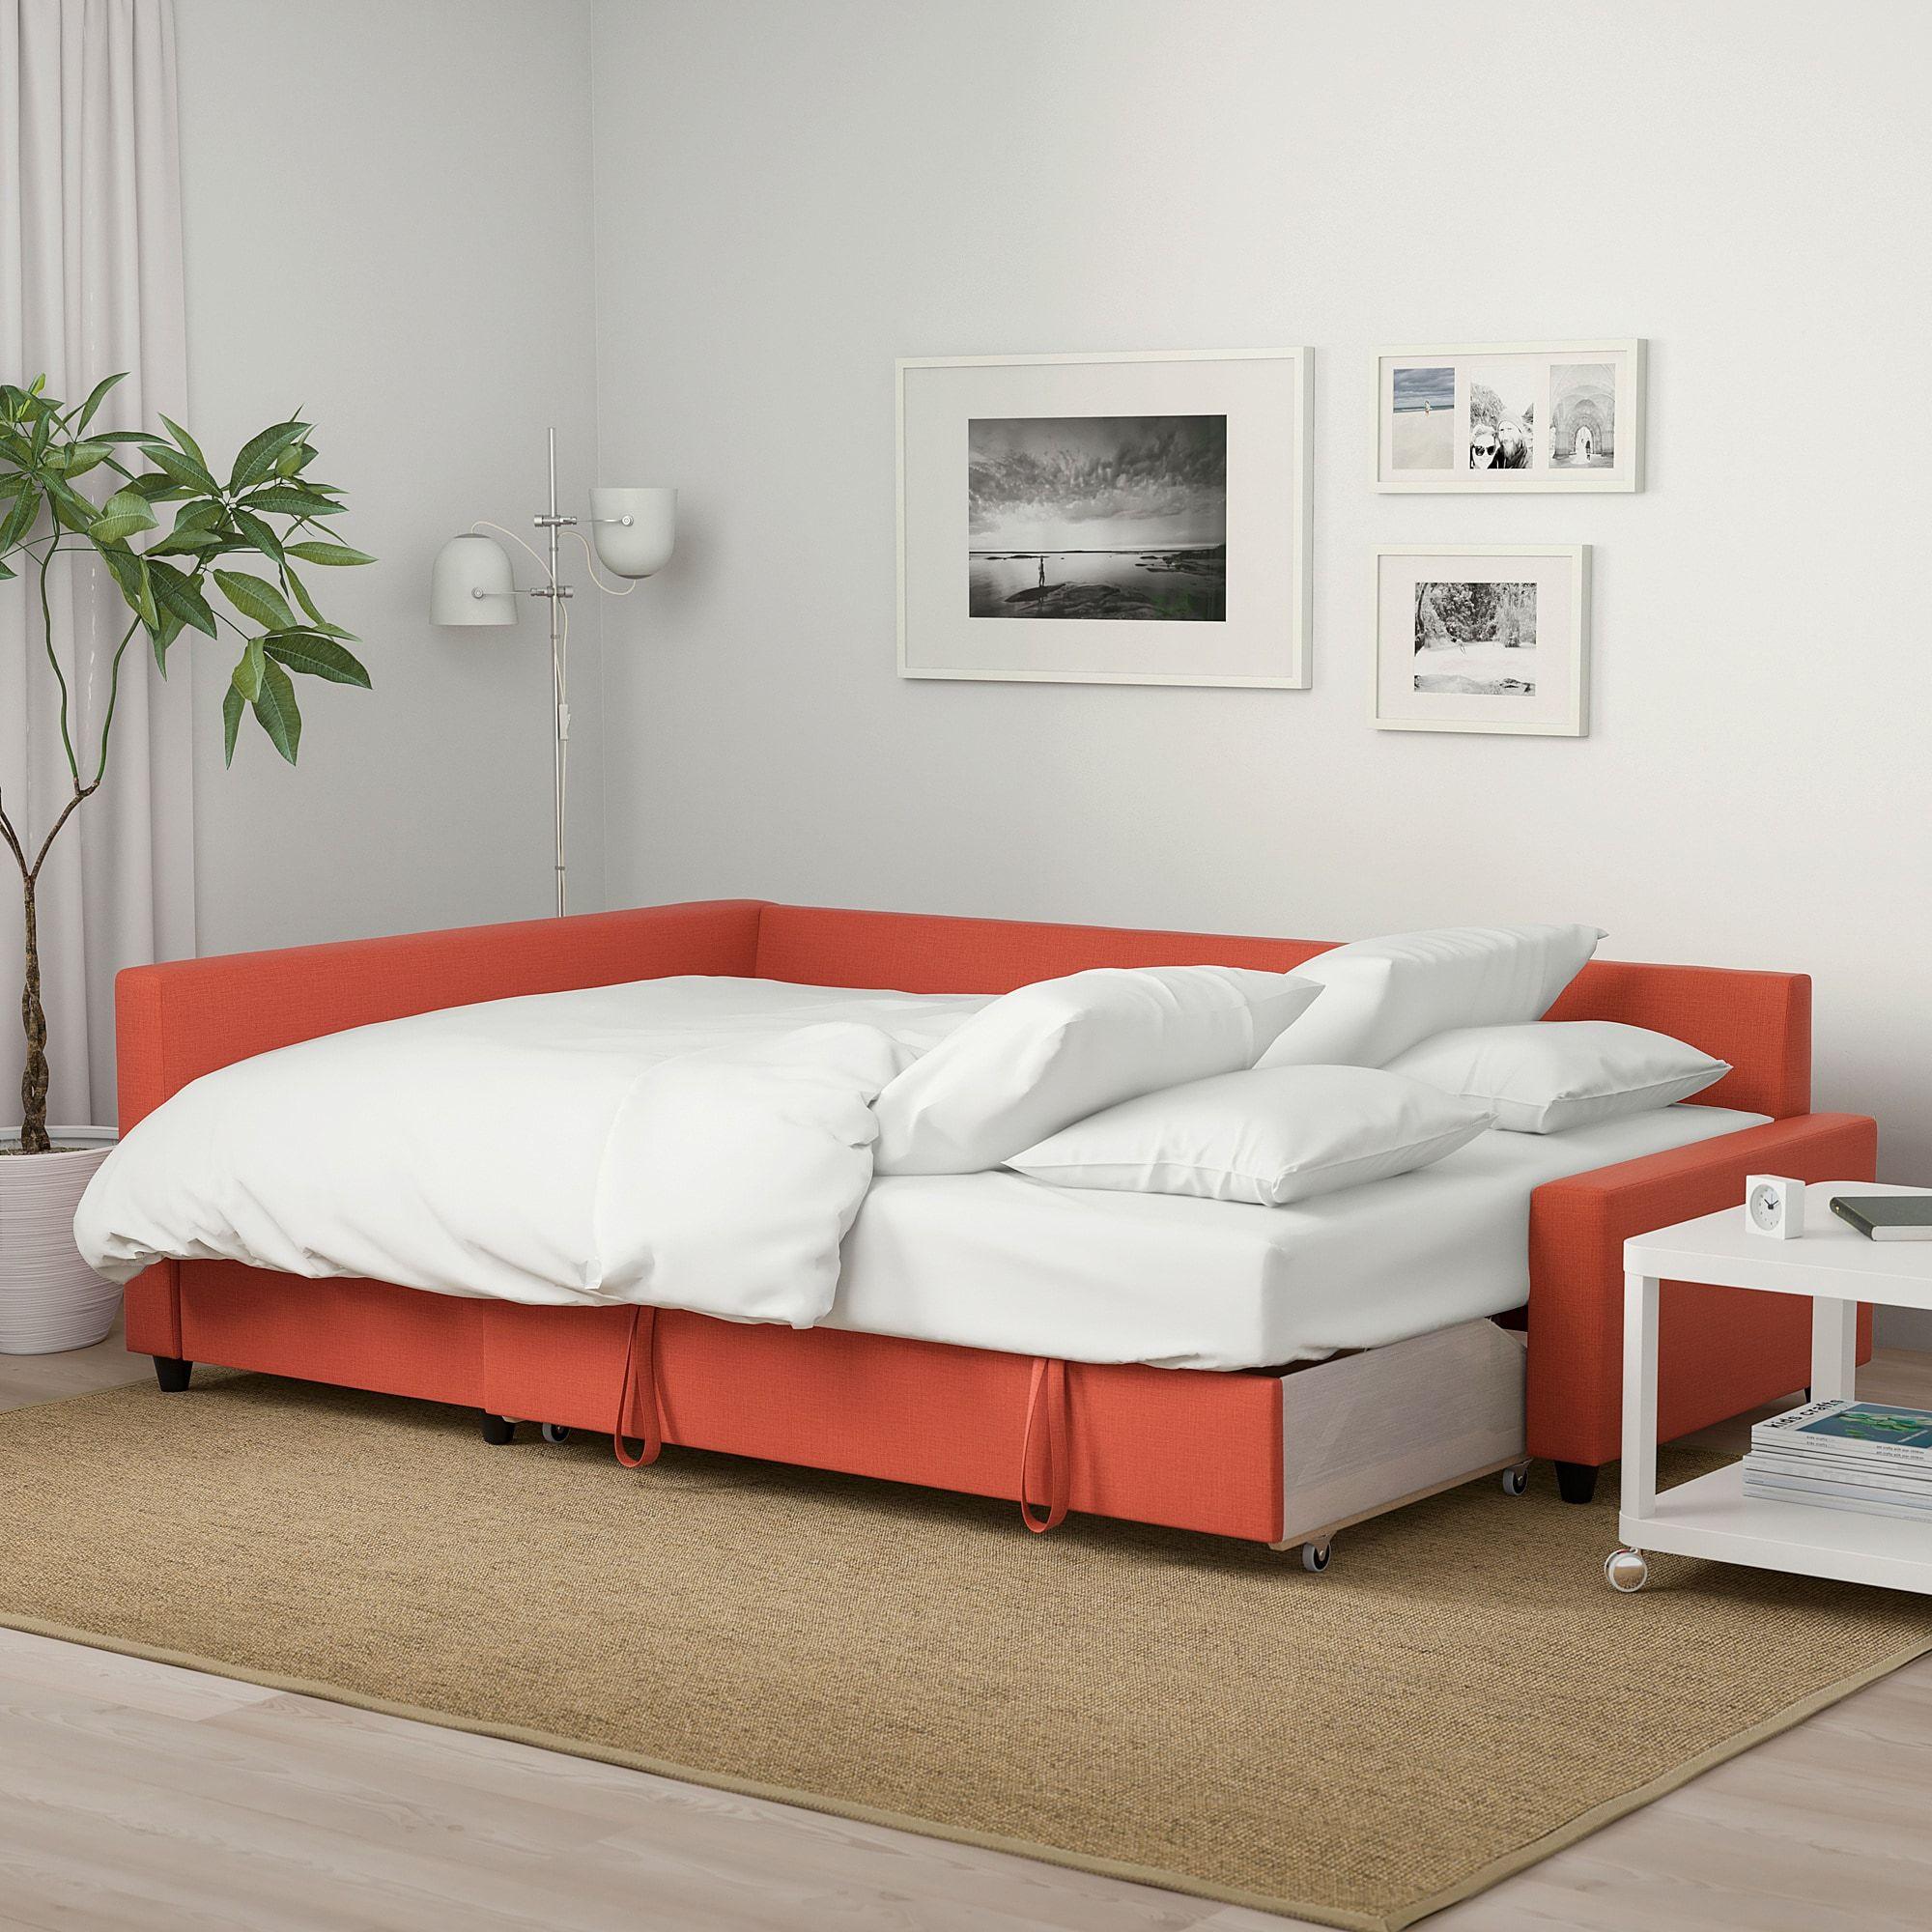 ikea friheten corner sofa bed with storage skiftebo dark orange in rh pinterest com